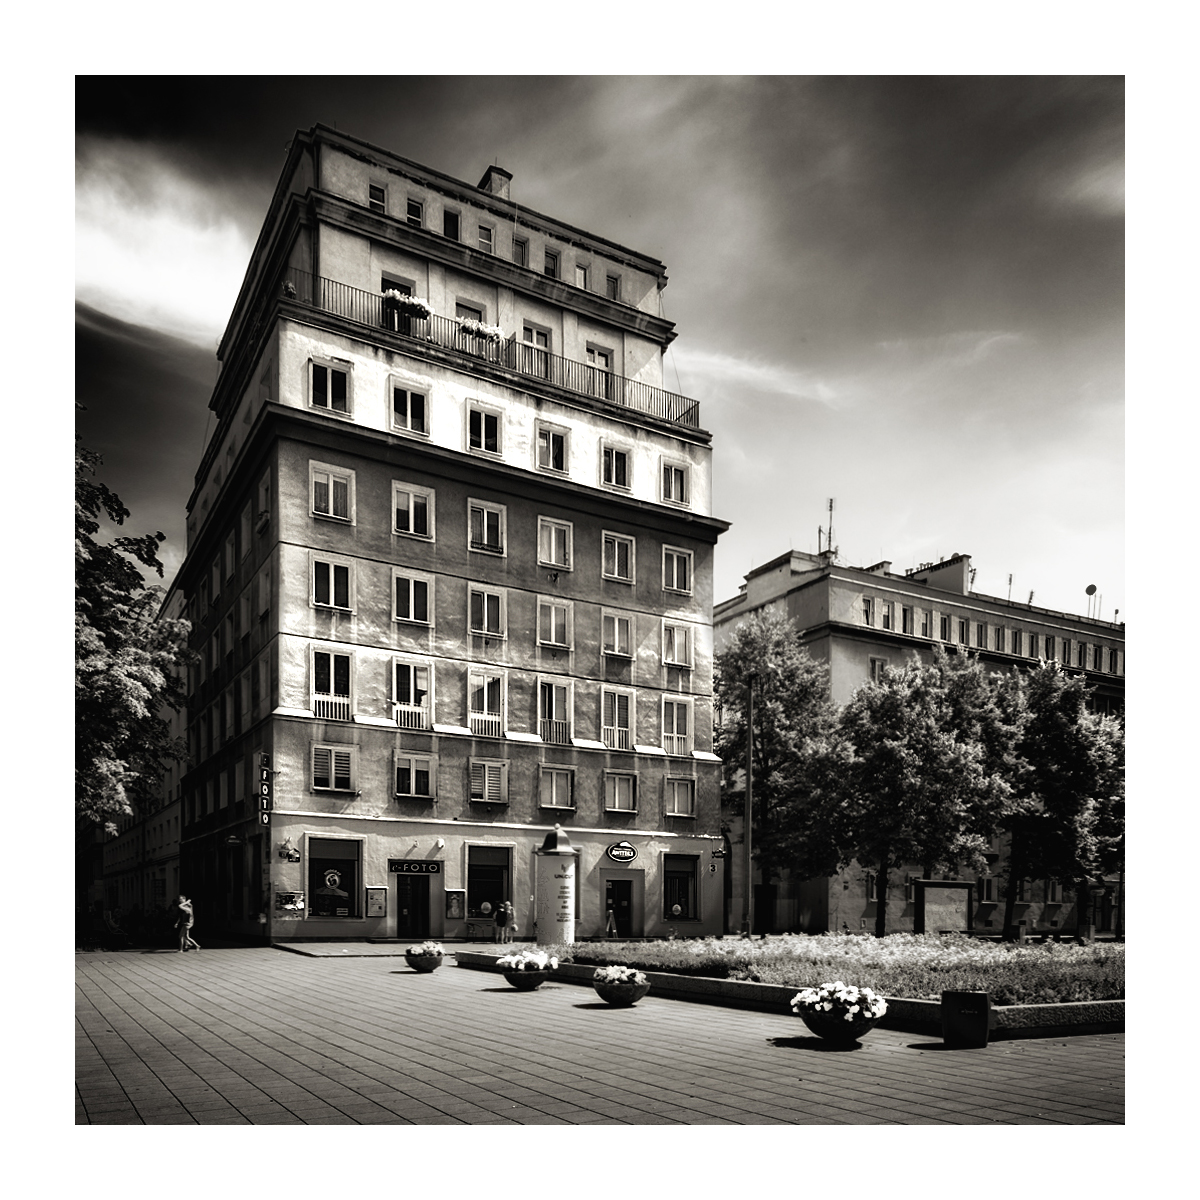 Nowa Huta. Kraków. Di Francesco Merenda